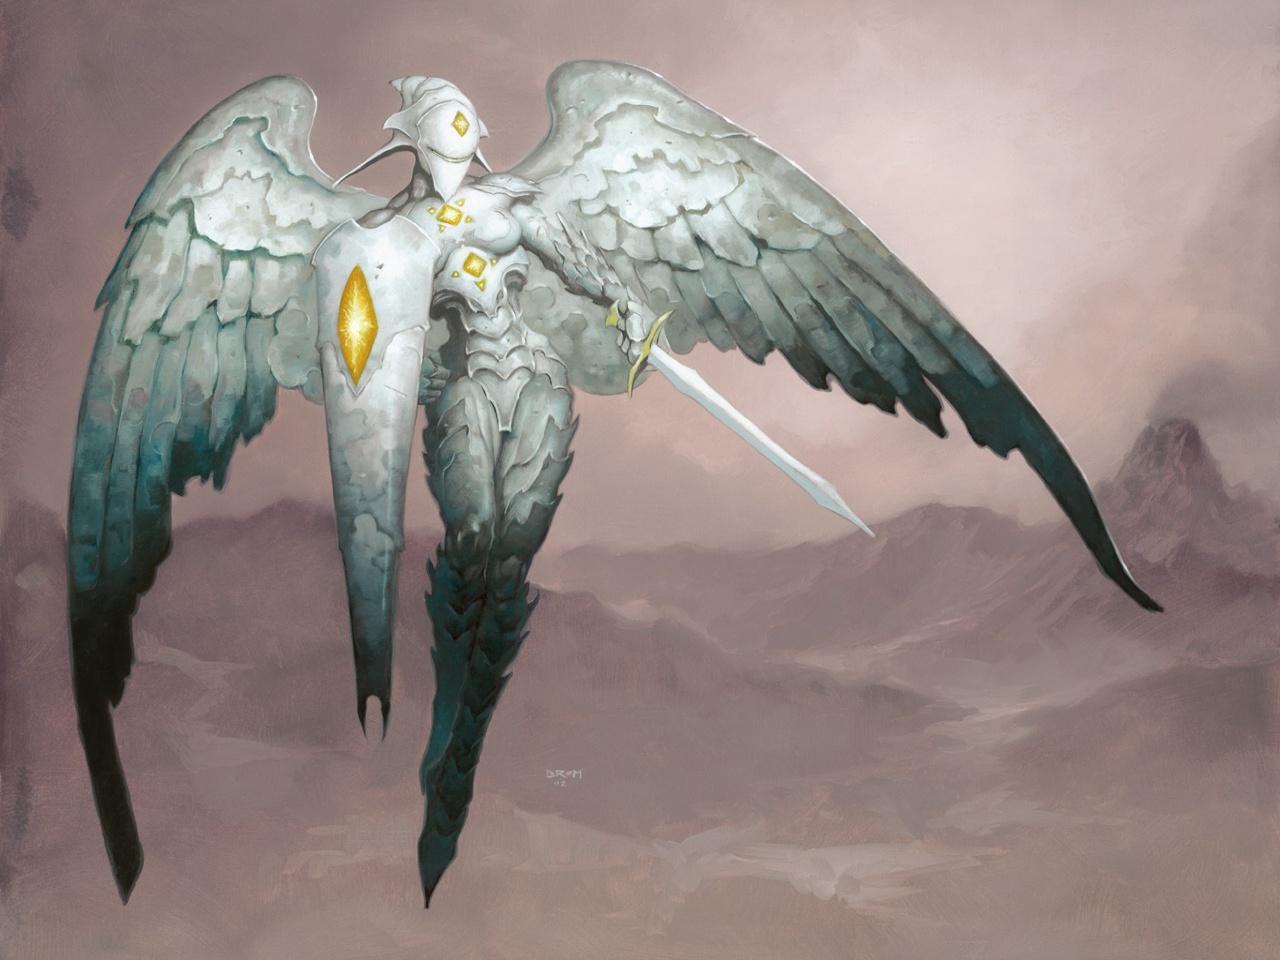 Fábrica de Anjos-Nour Rodrigues Platinum_angel_by_bljub-d47hovo